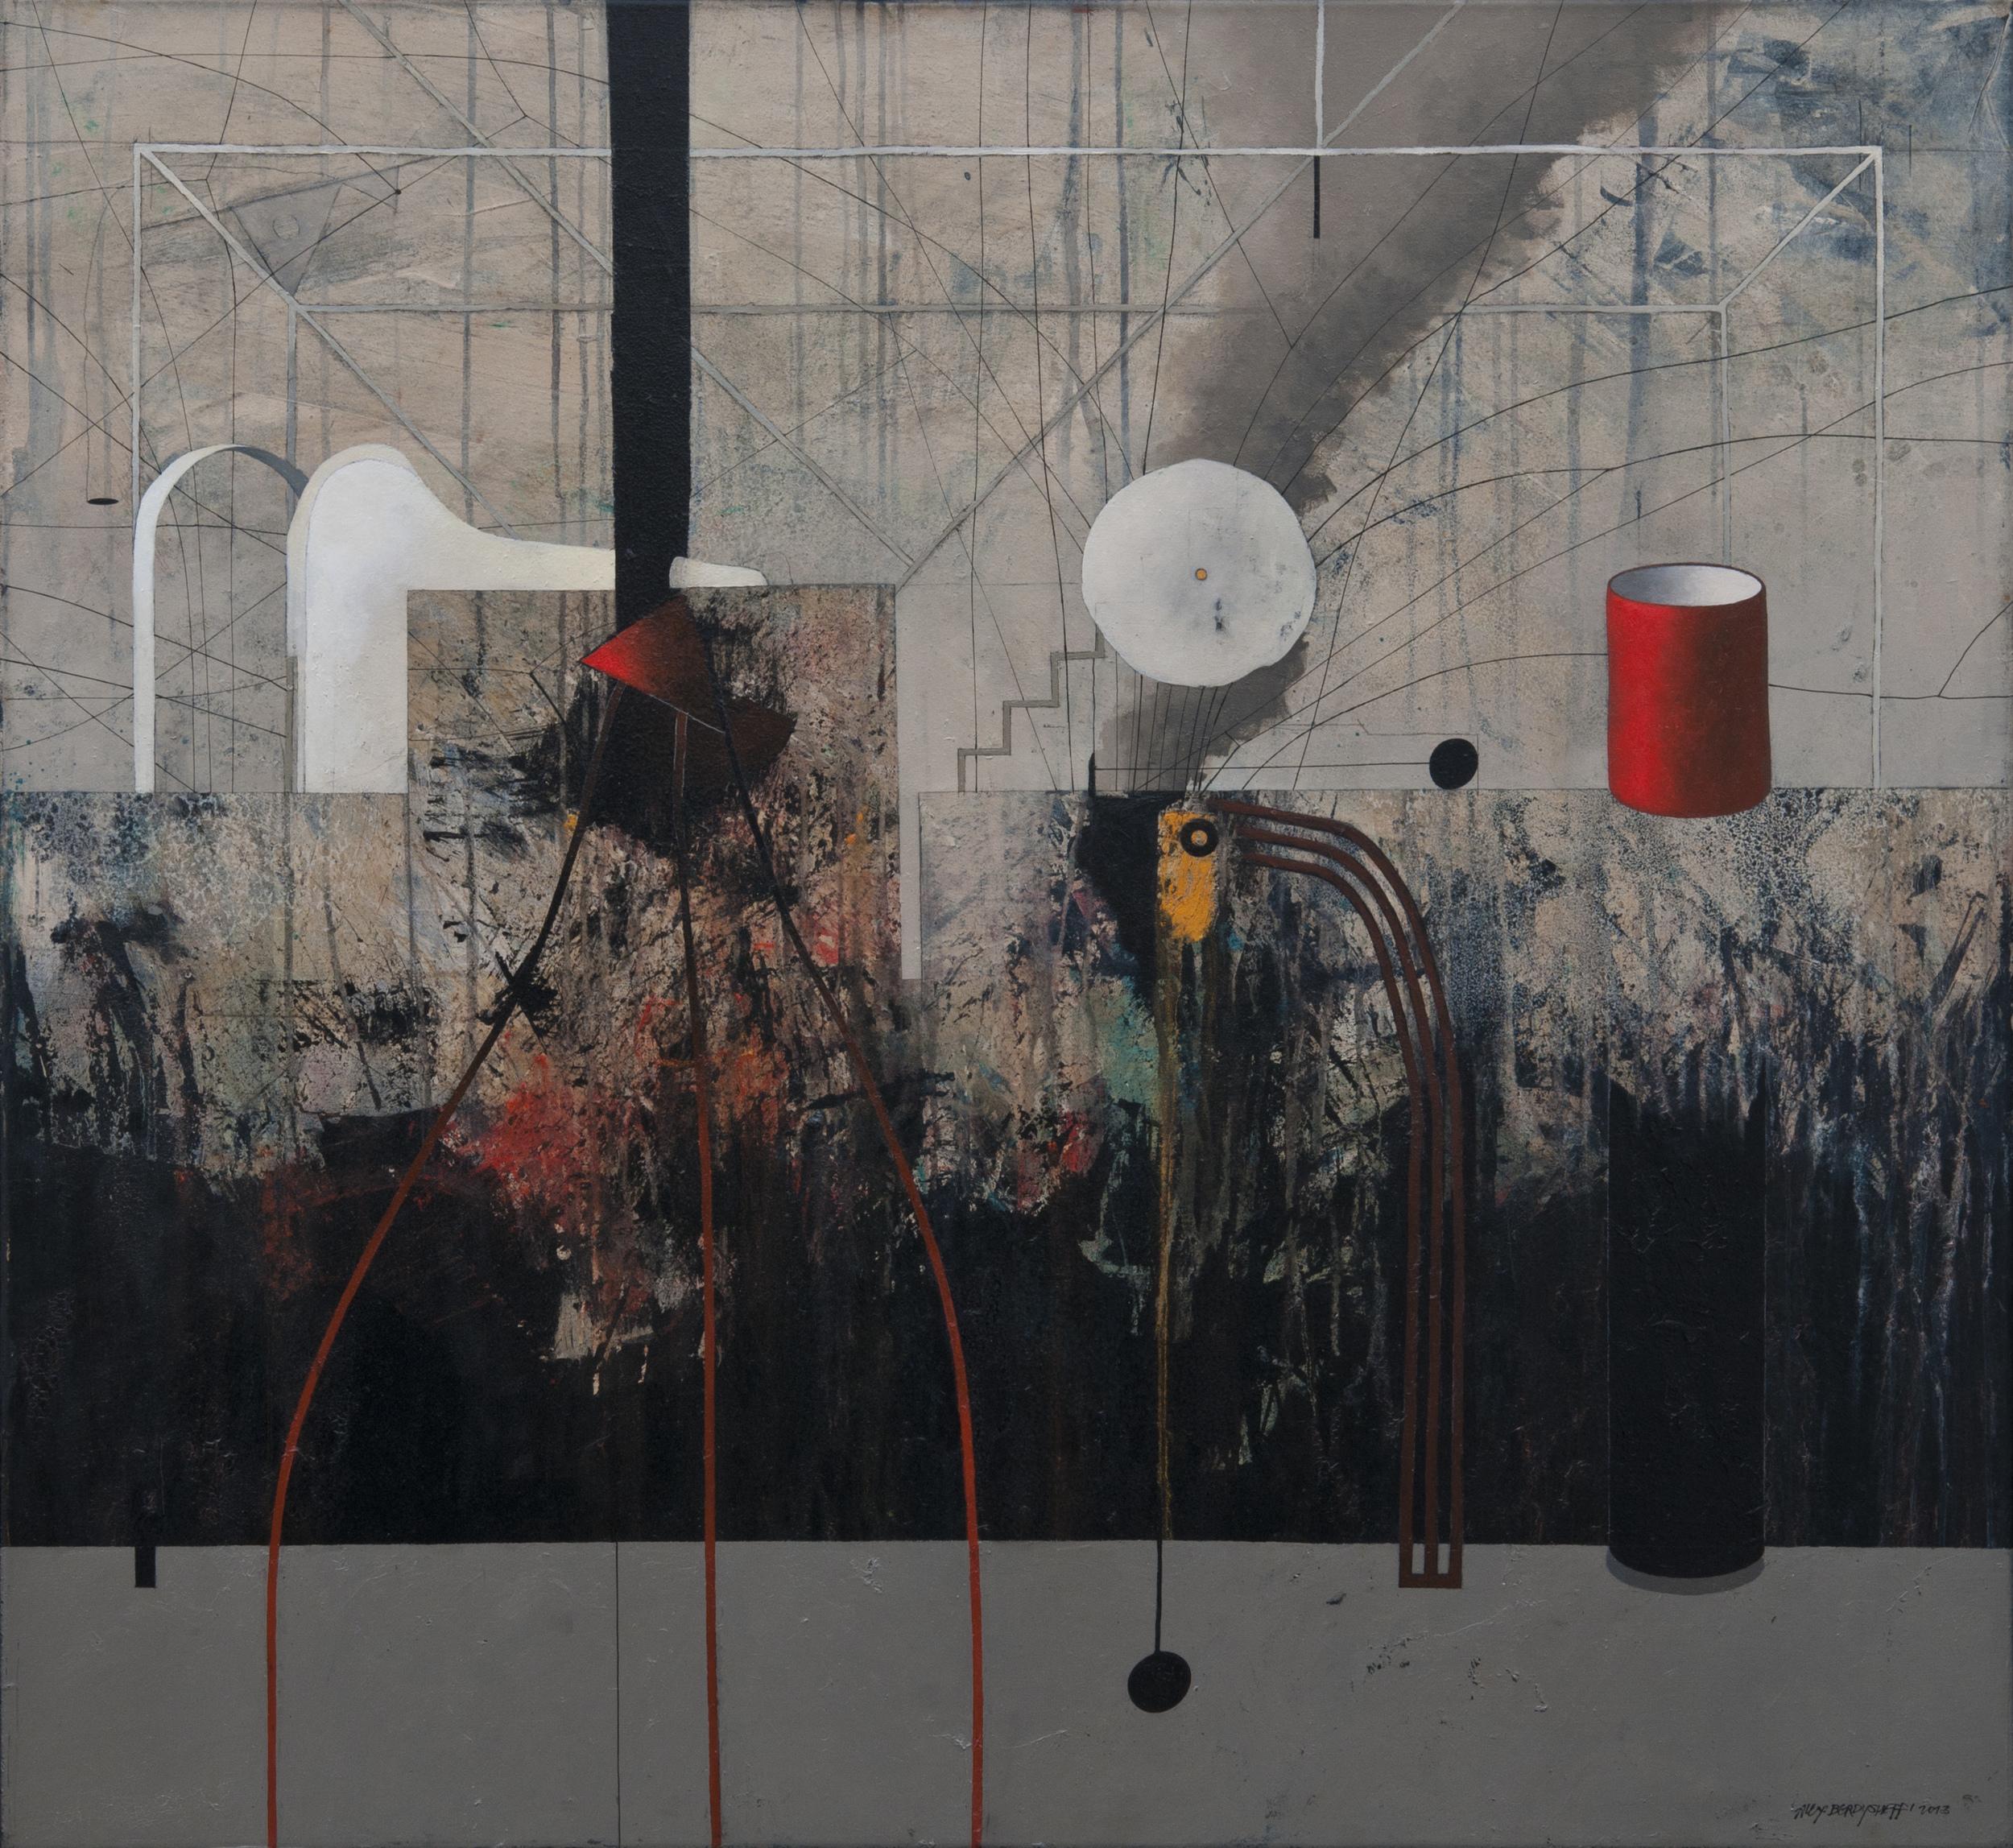 Casa I, oil on canvas, 110x120 cm, 2013